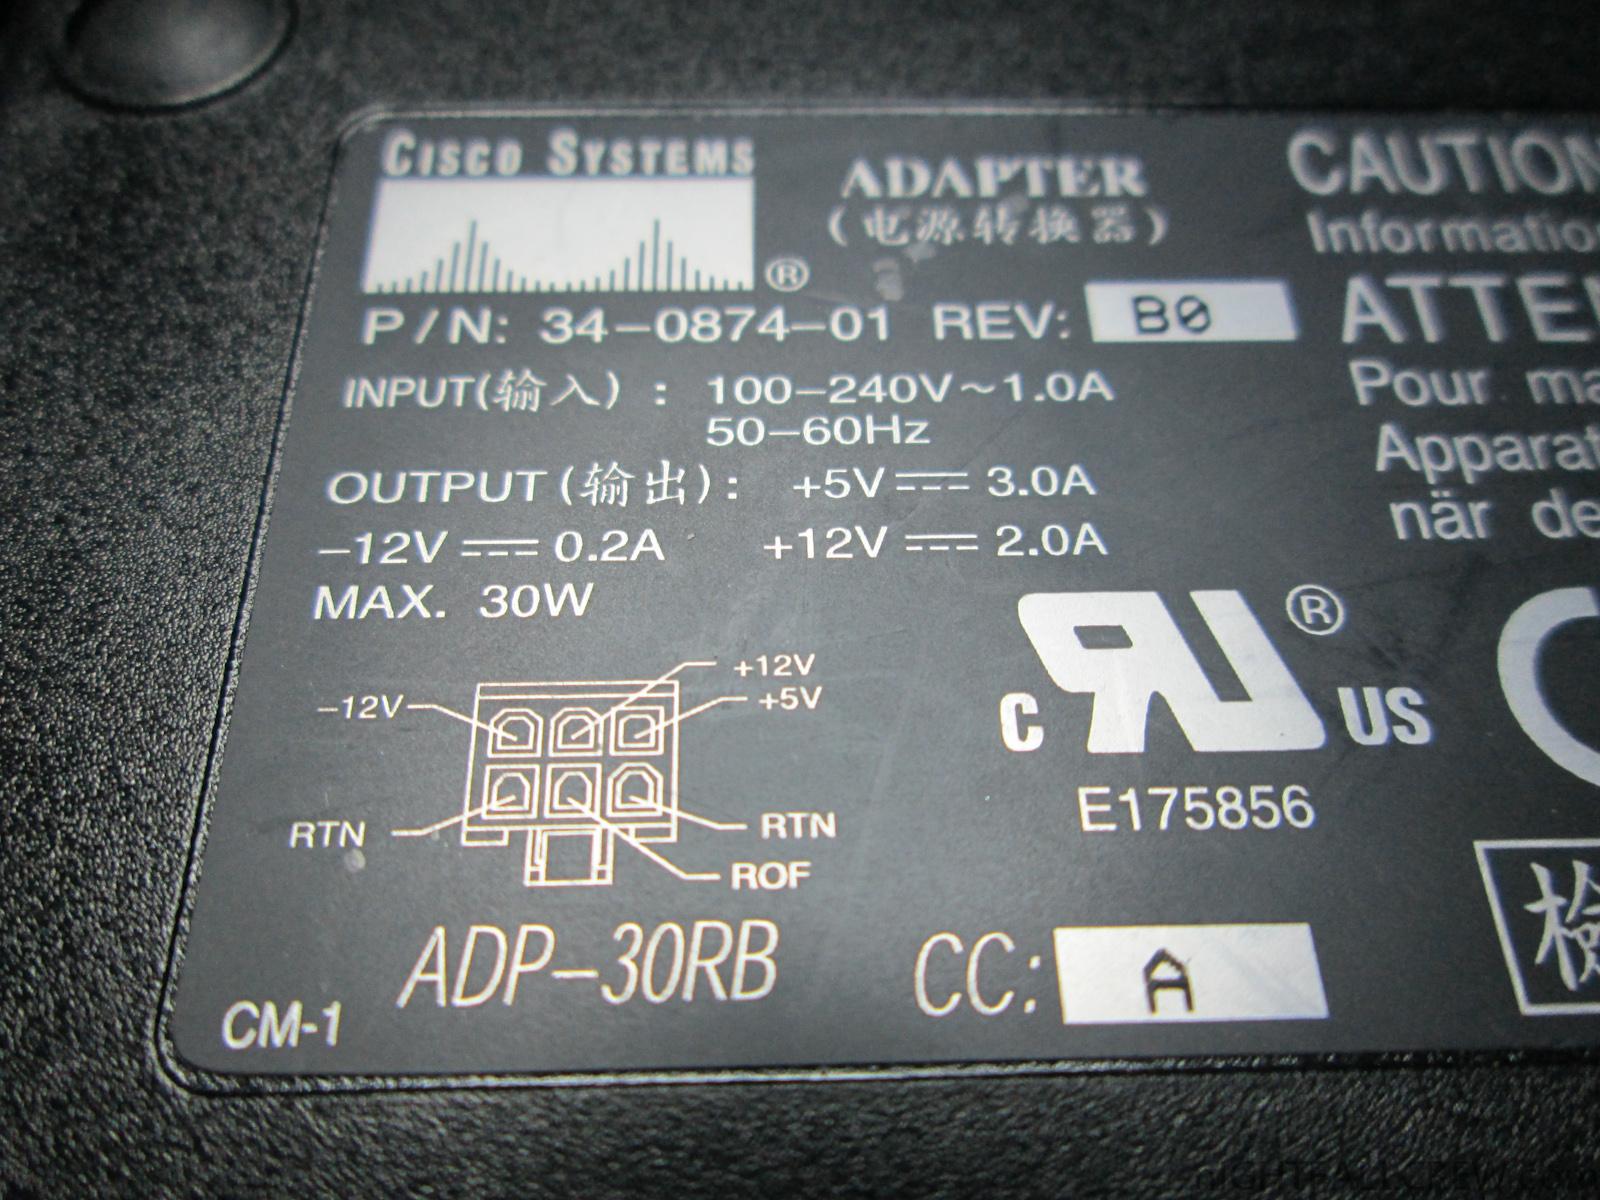 Amstrad Cpc 6128 664 Power Supply Cisco 34 0874 01